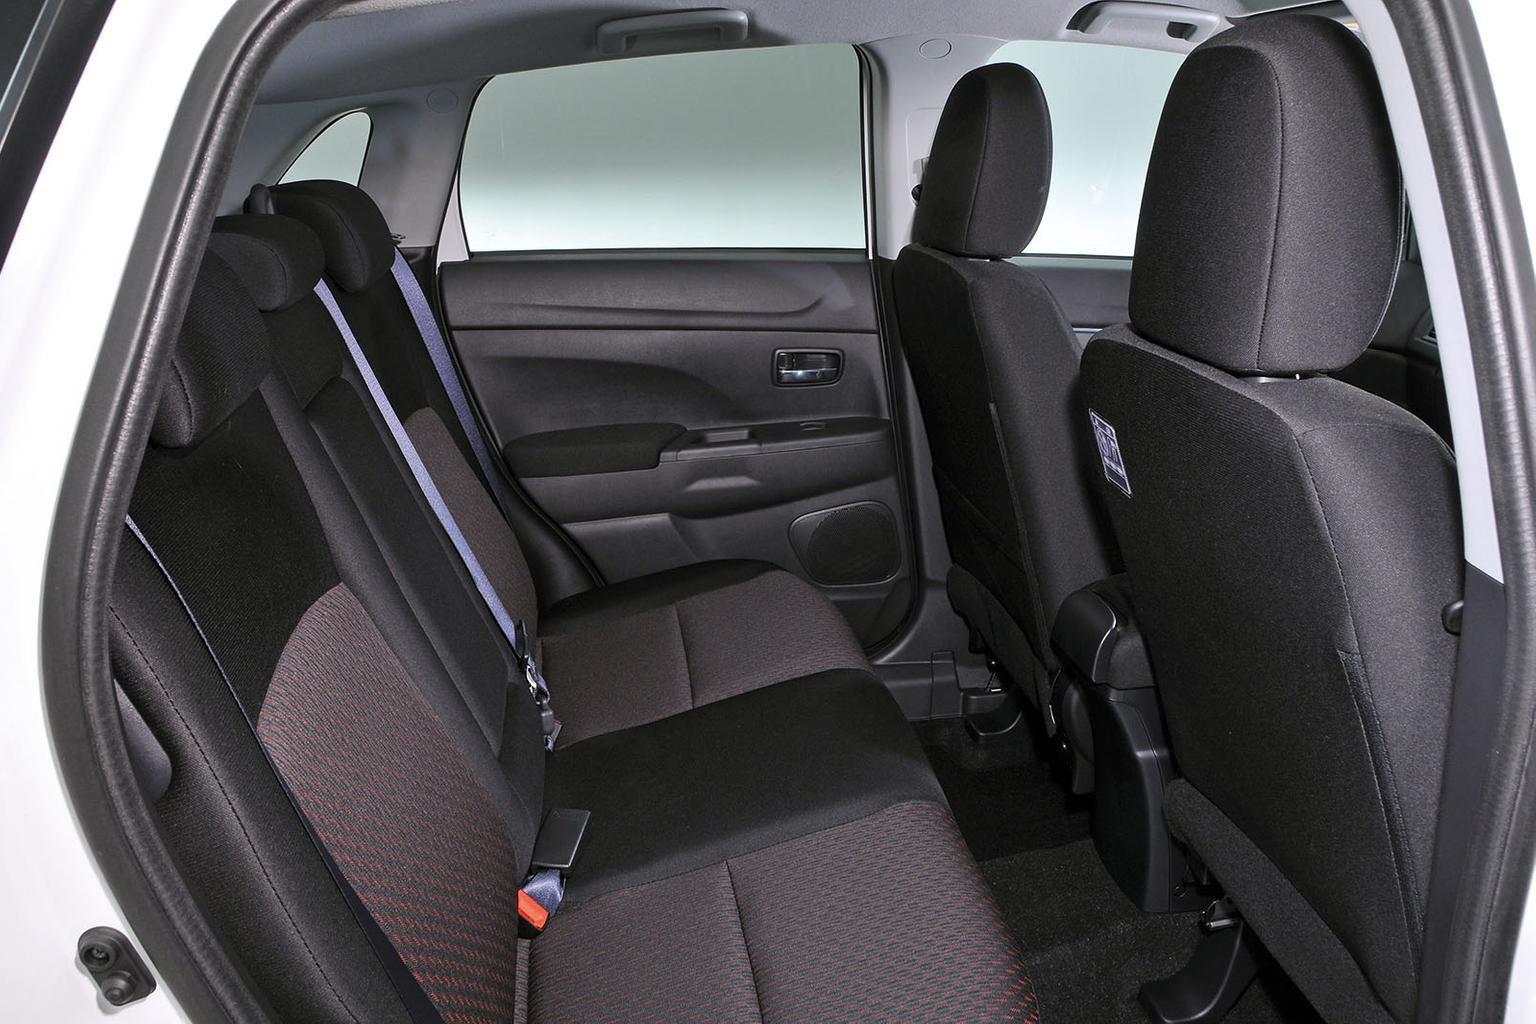 New Mitsubishi ASX vs Seat Ateca vs Vauxhall Mokka X